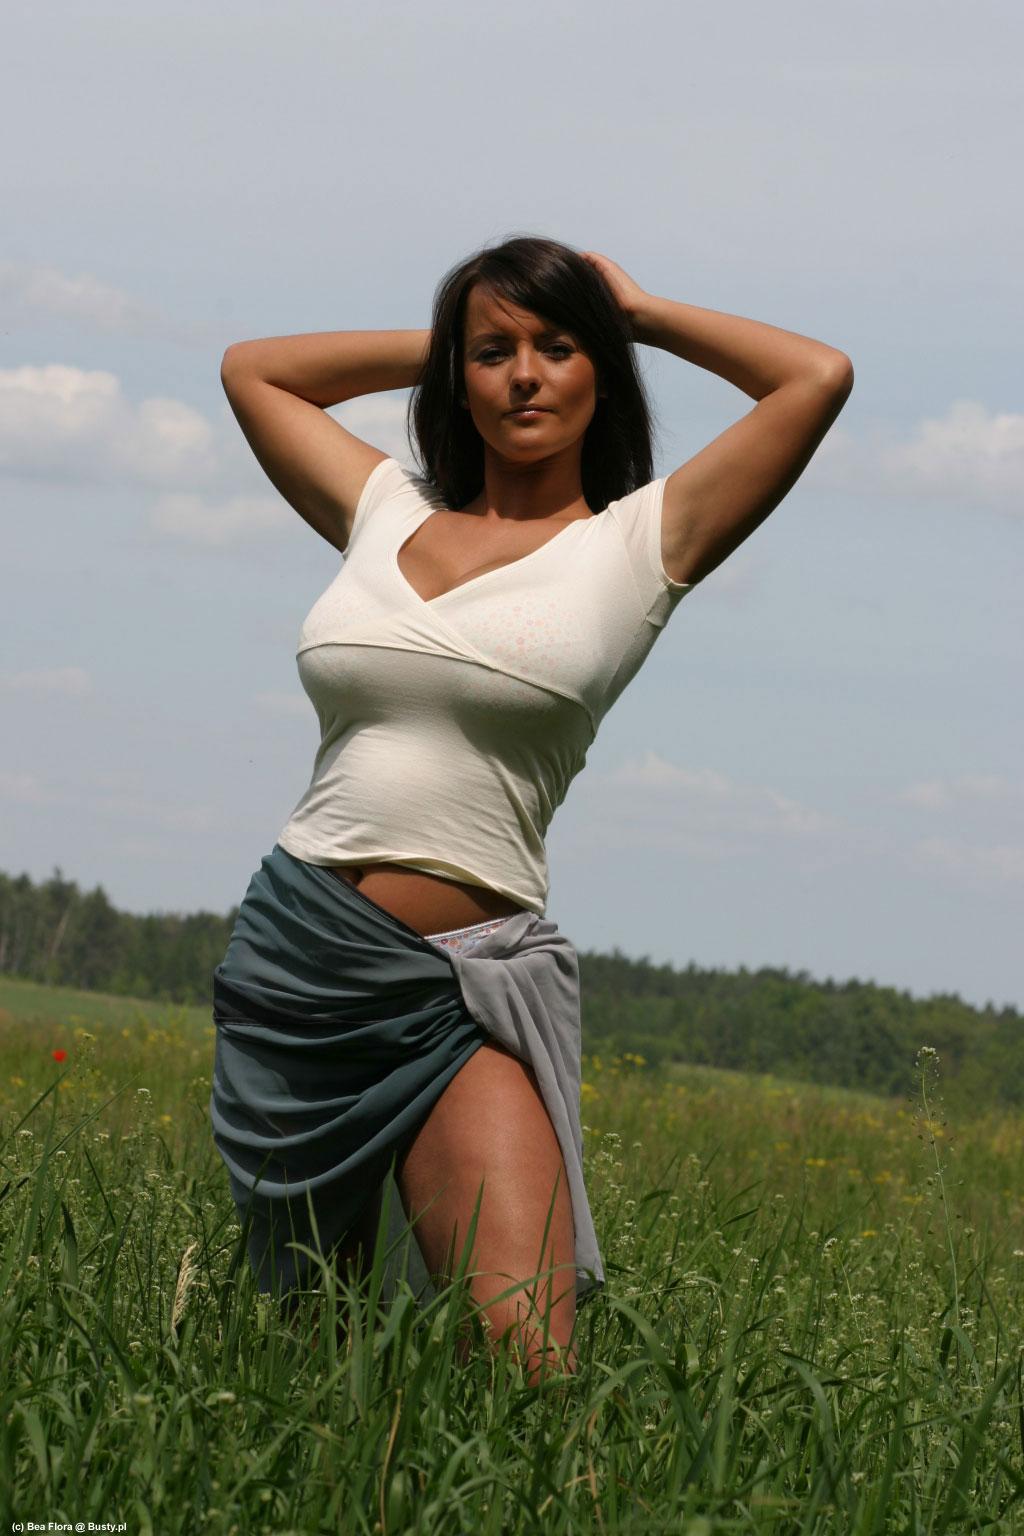 vergin girl naked picture